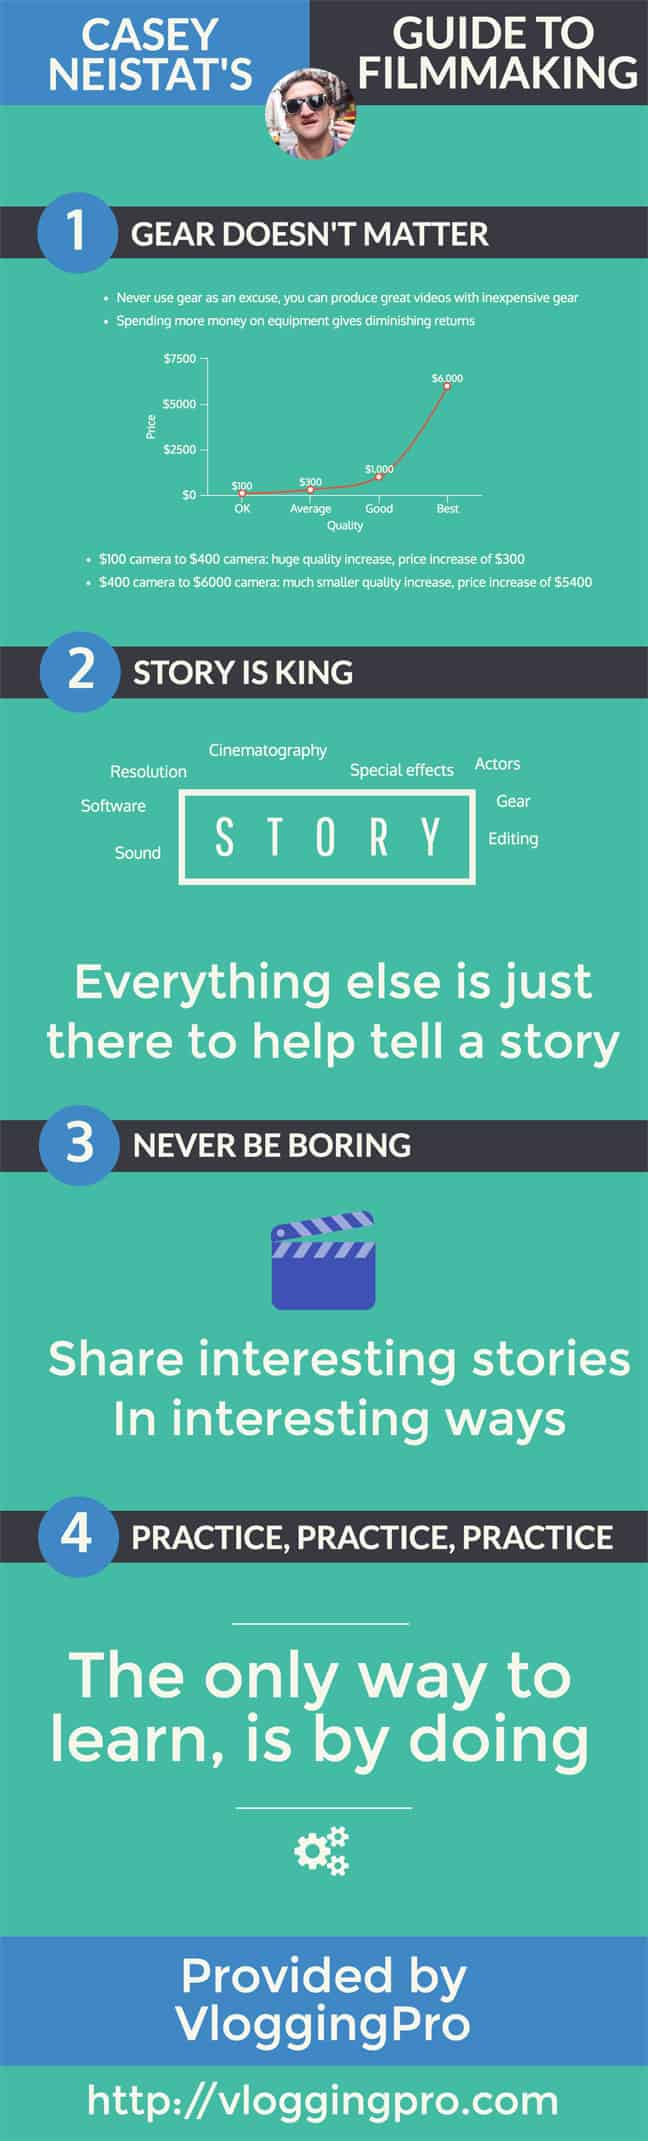 Casey Neistat Guide to Filmmaking